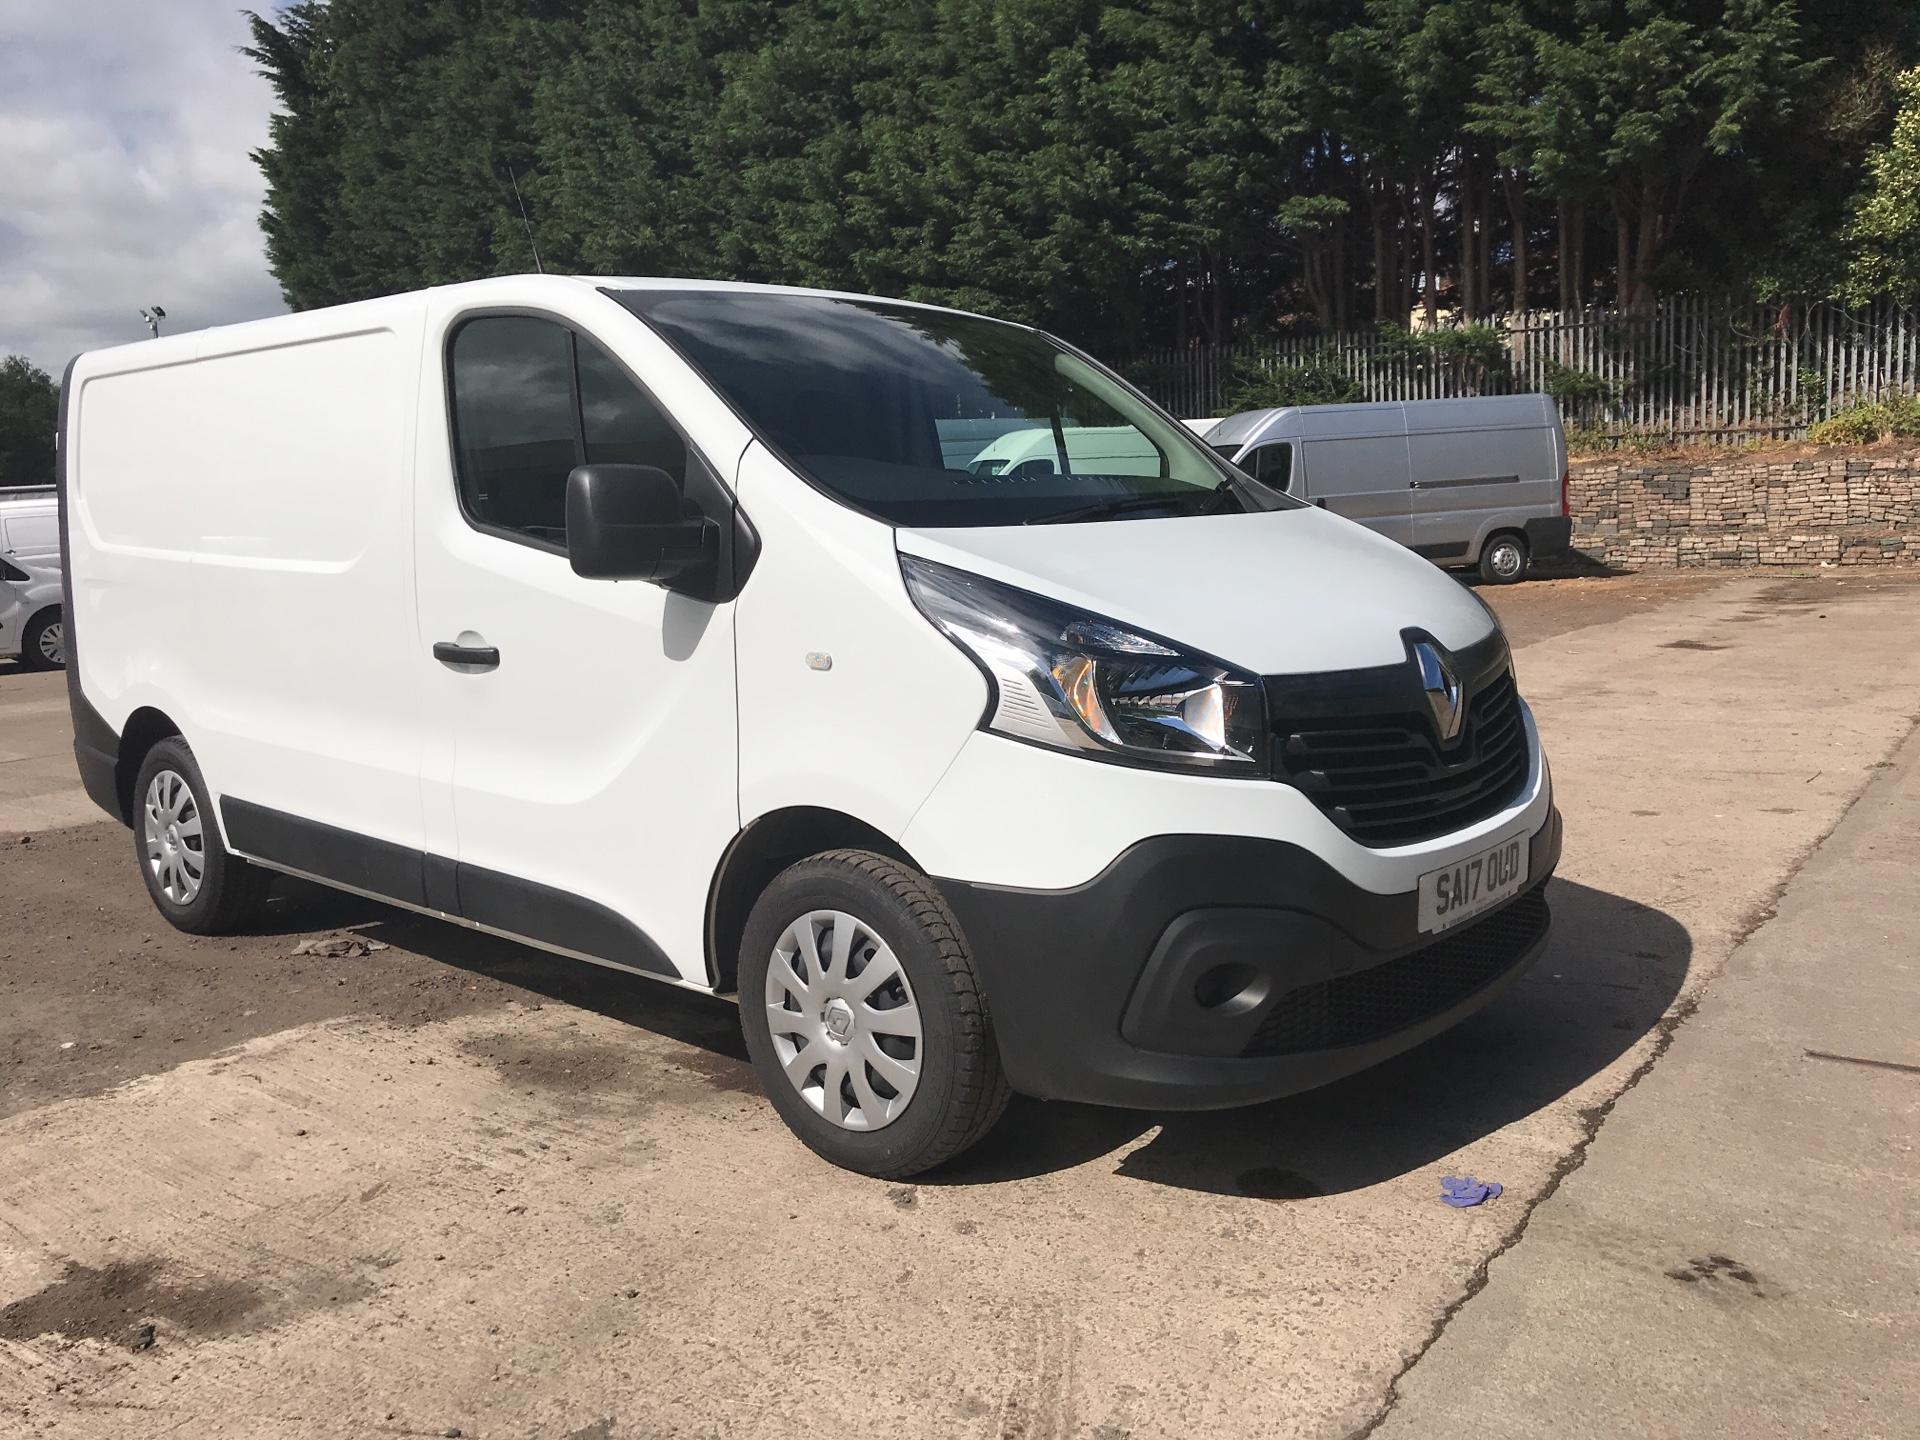 2017 Renault Trafic Sl27 Dci 120 Business Van (SA17OUD)